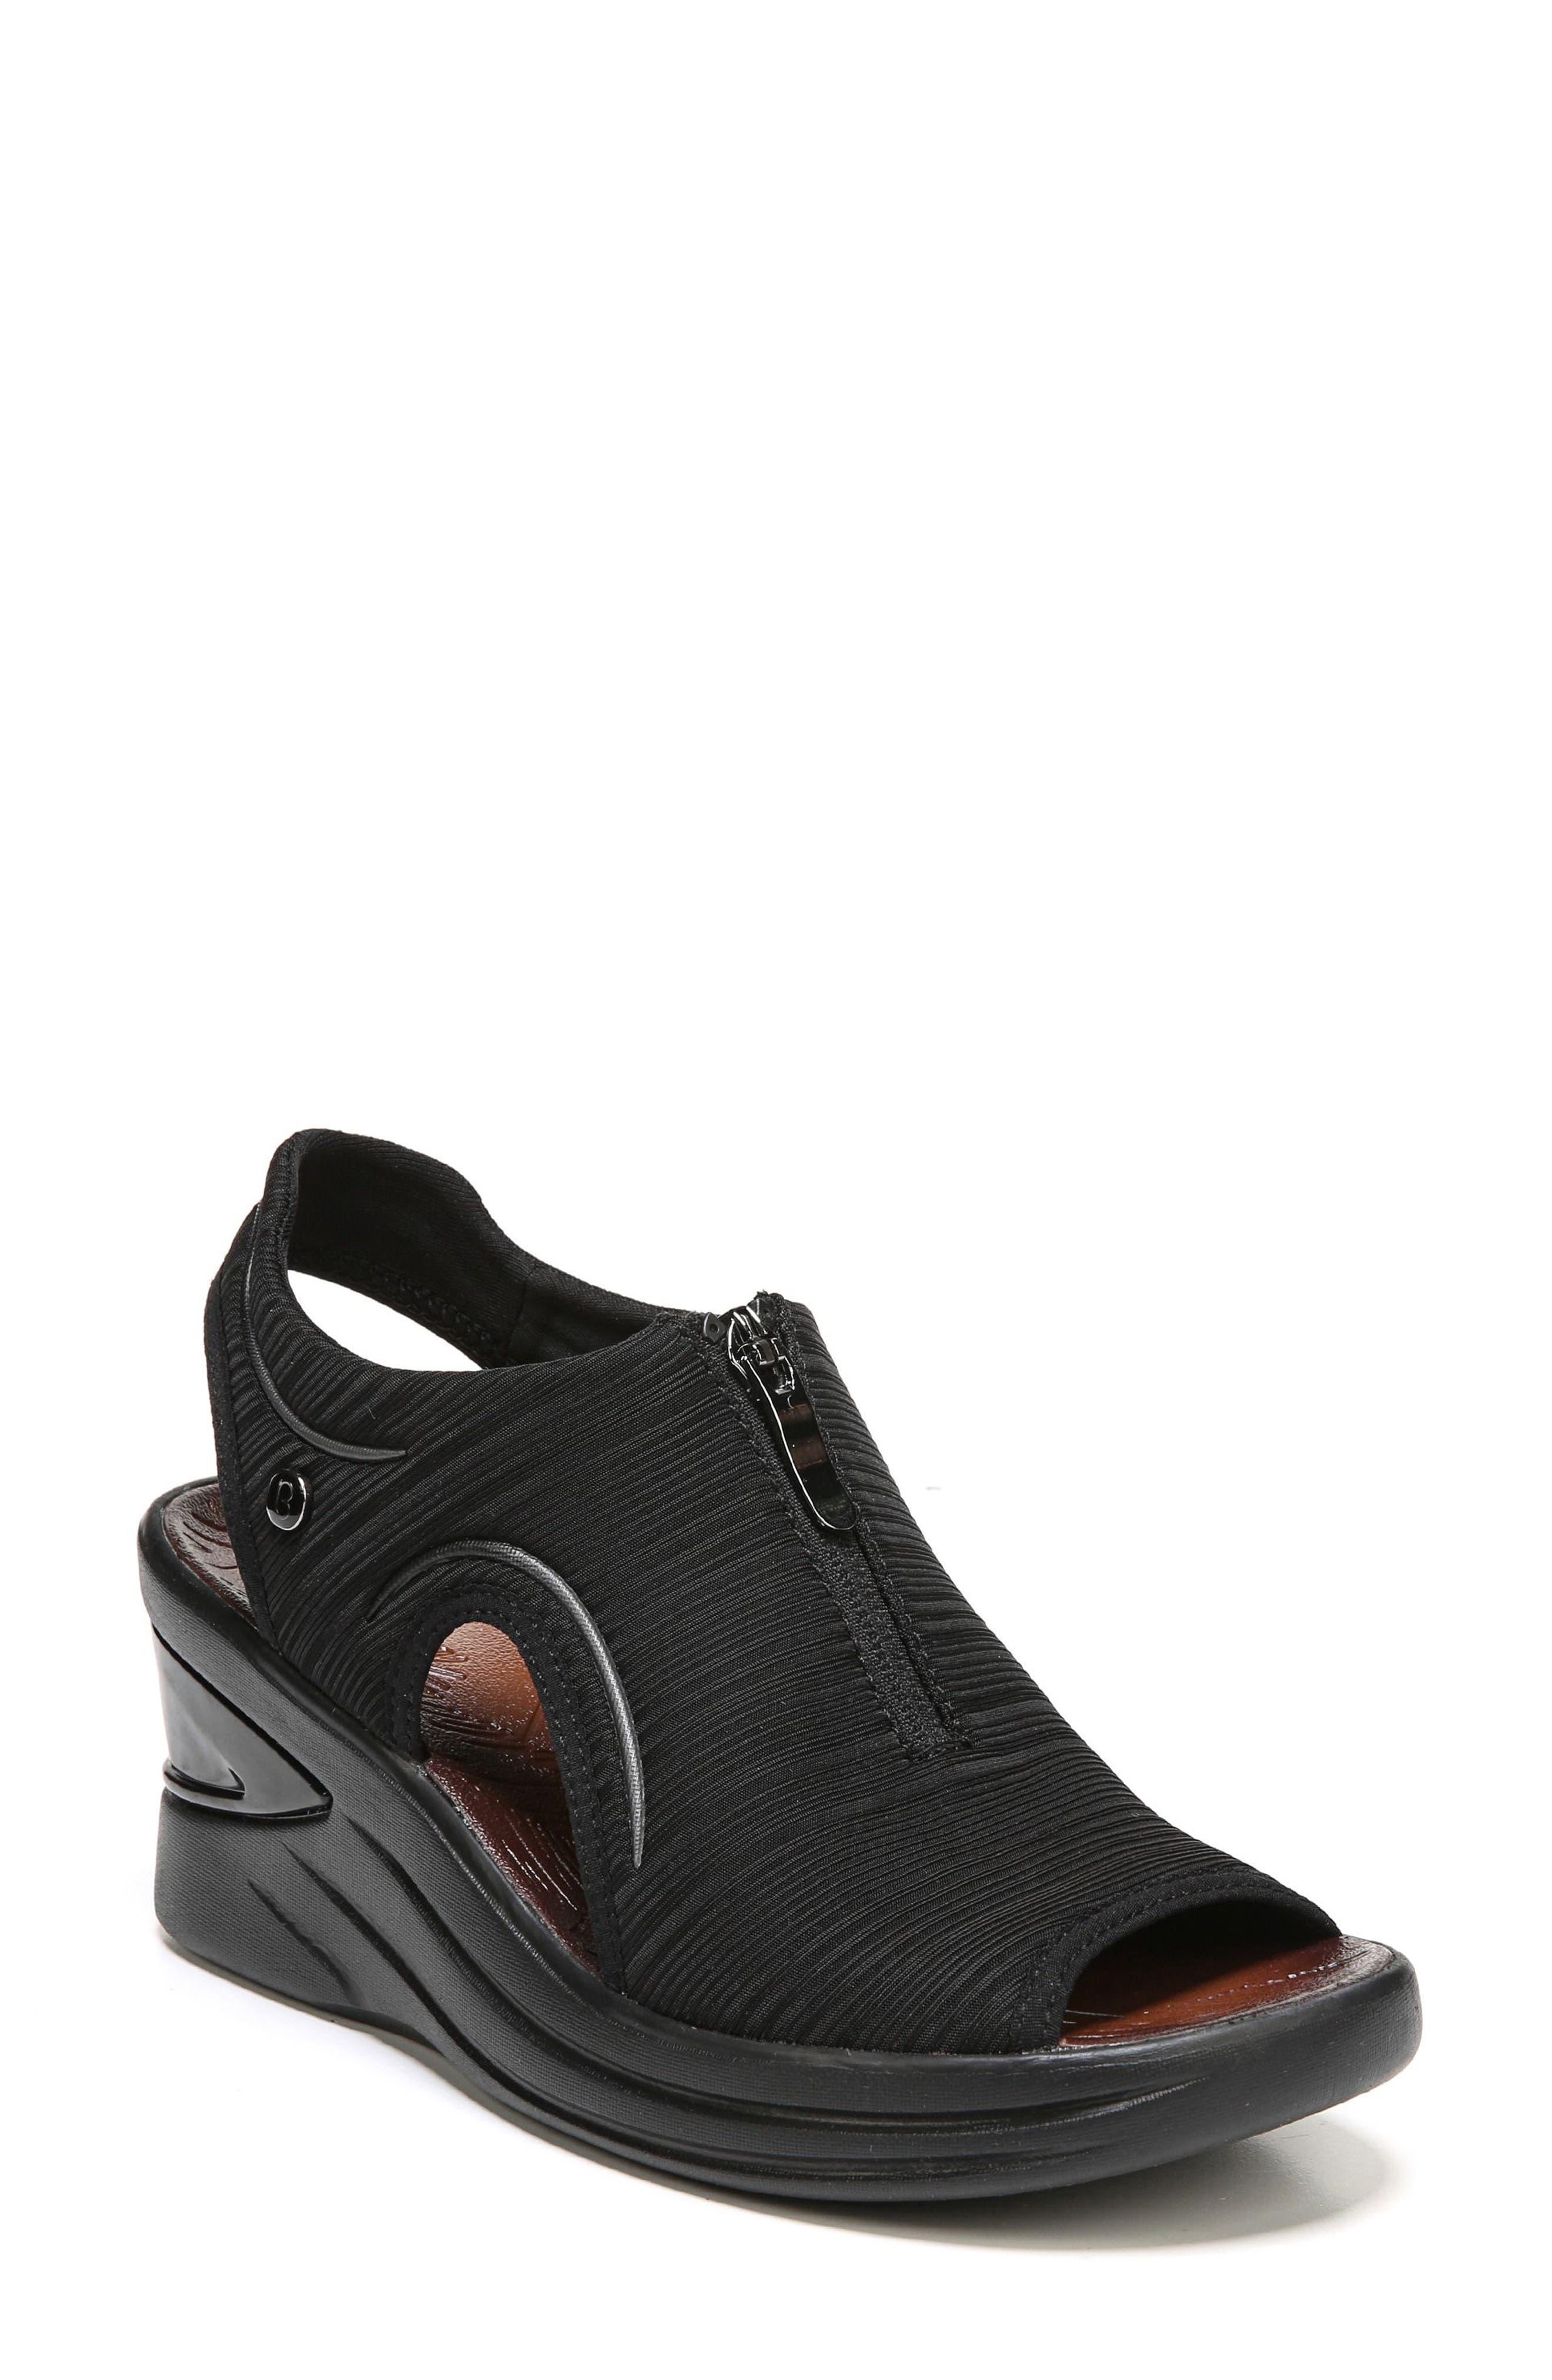 BZEES Vinny Wedge Sandal, Main, color, 001